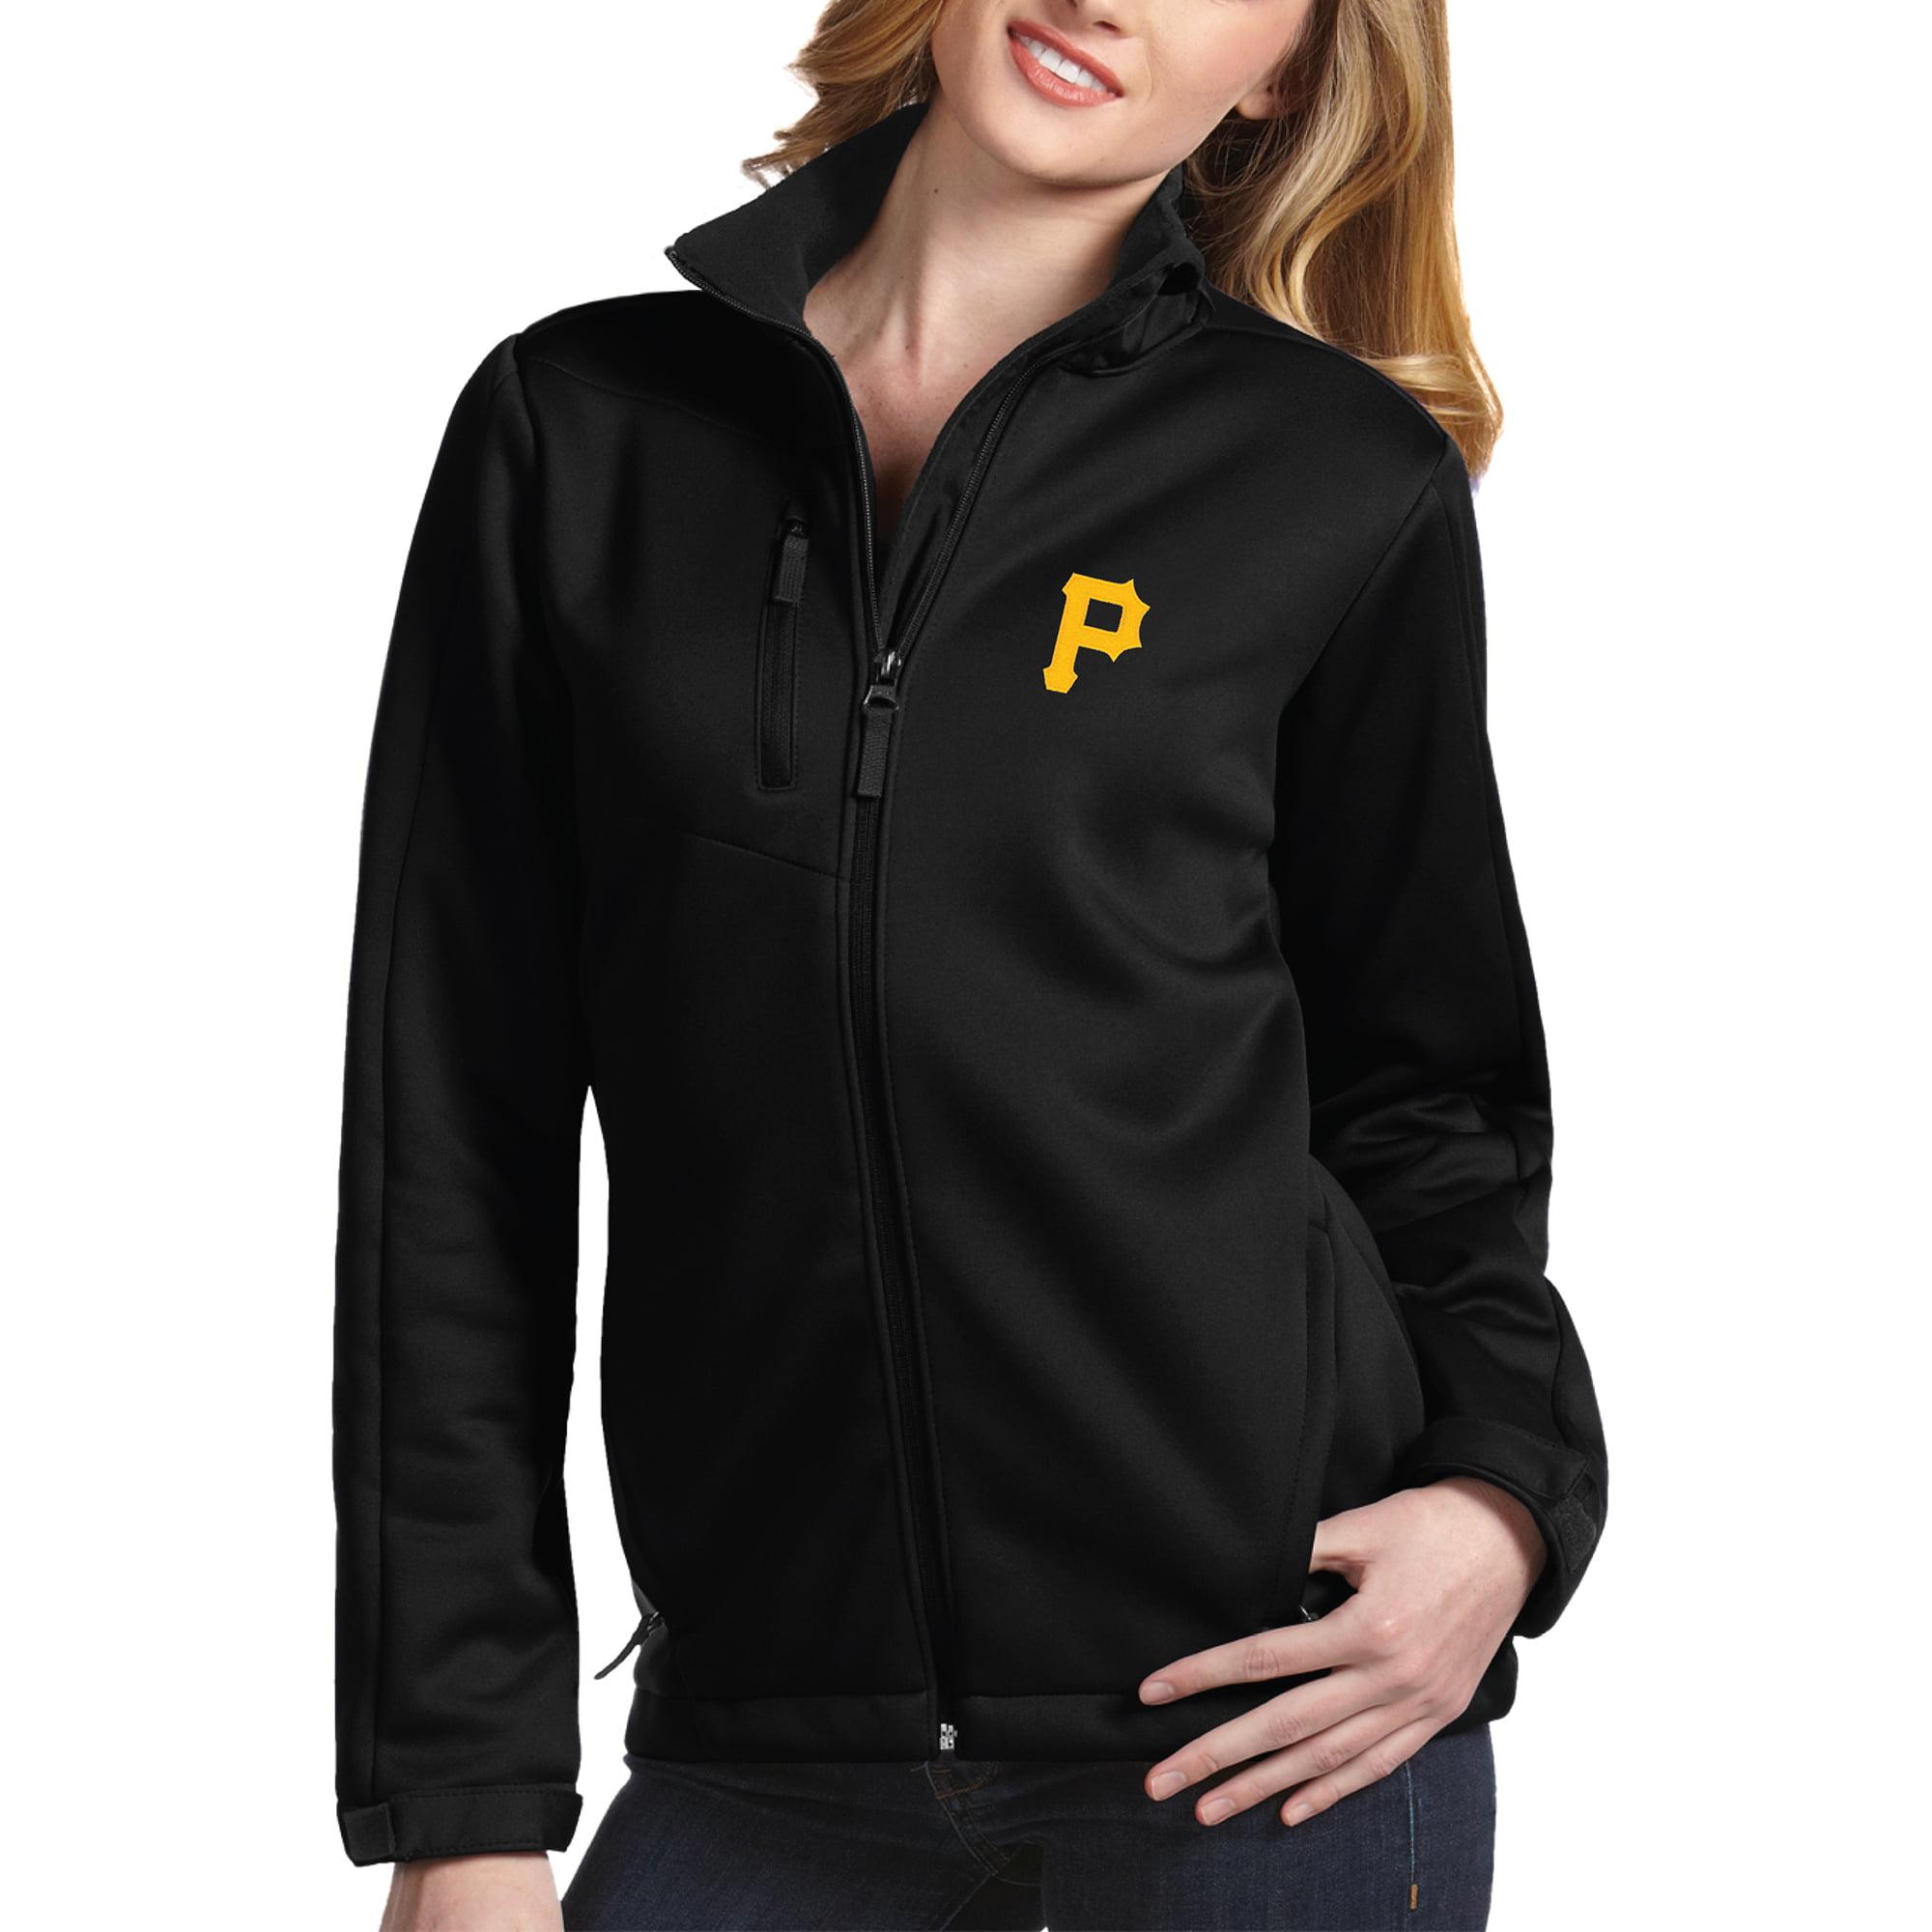 Pittsburgh Pirates Antigua Women's Traverse Jacket Black by ANTIGUA GROUP/ 22534